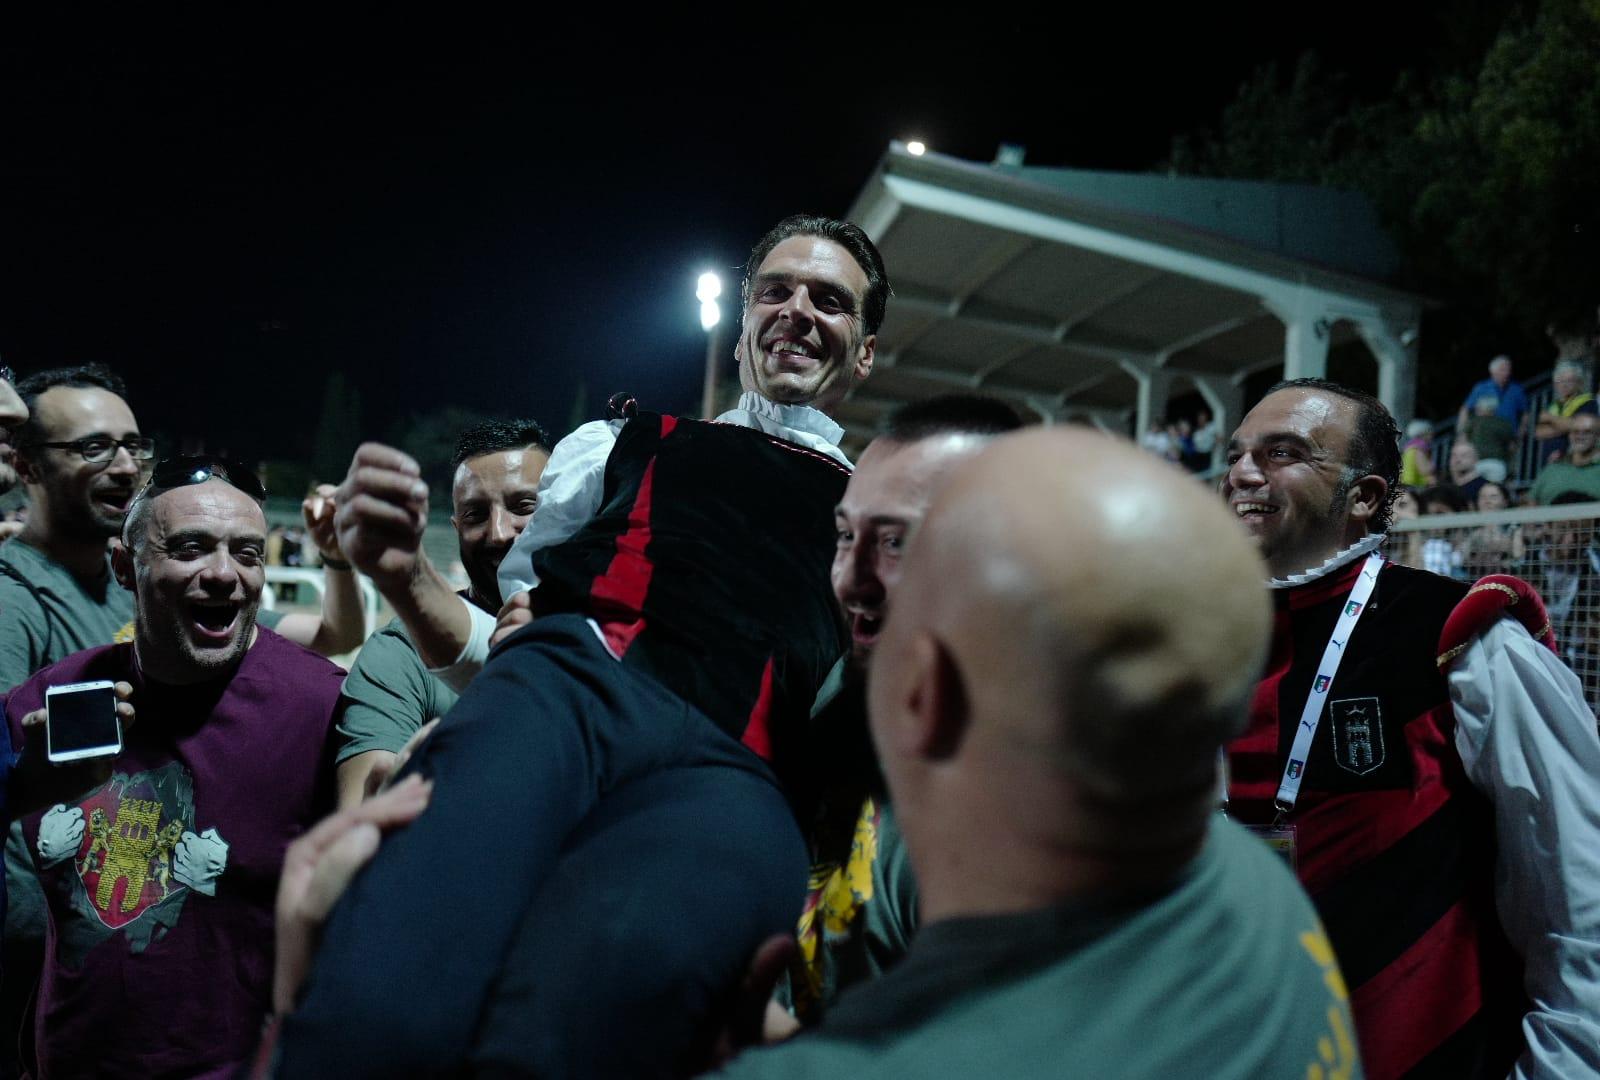 Tufilla vince quintana 2018 gubbini trionfo